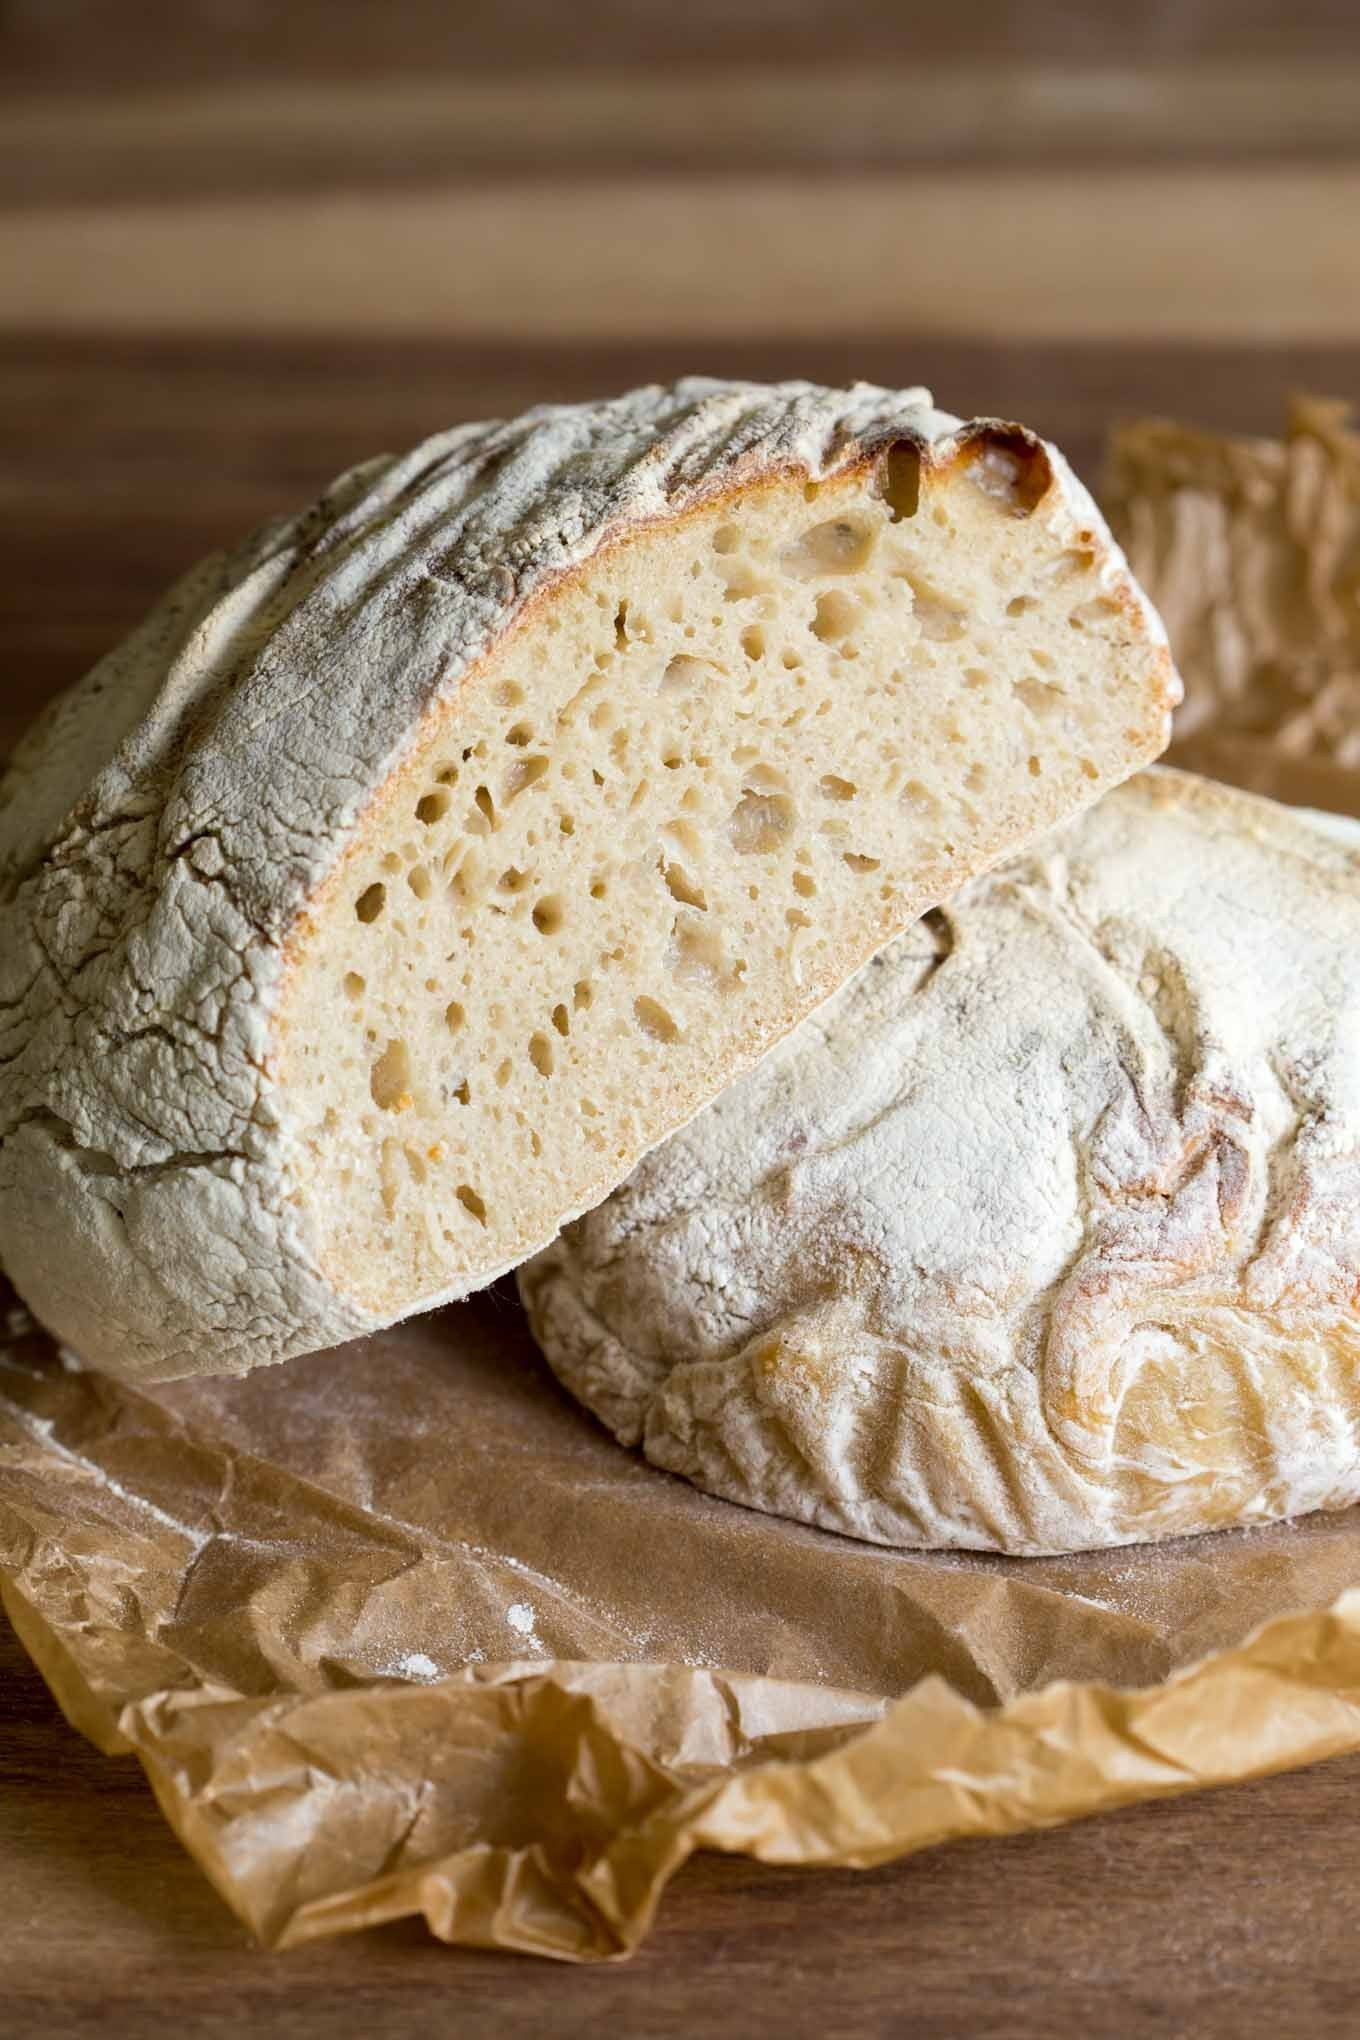 Making Sourdough Bread  HOW TO MAKE SOURDOUGH BREAD